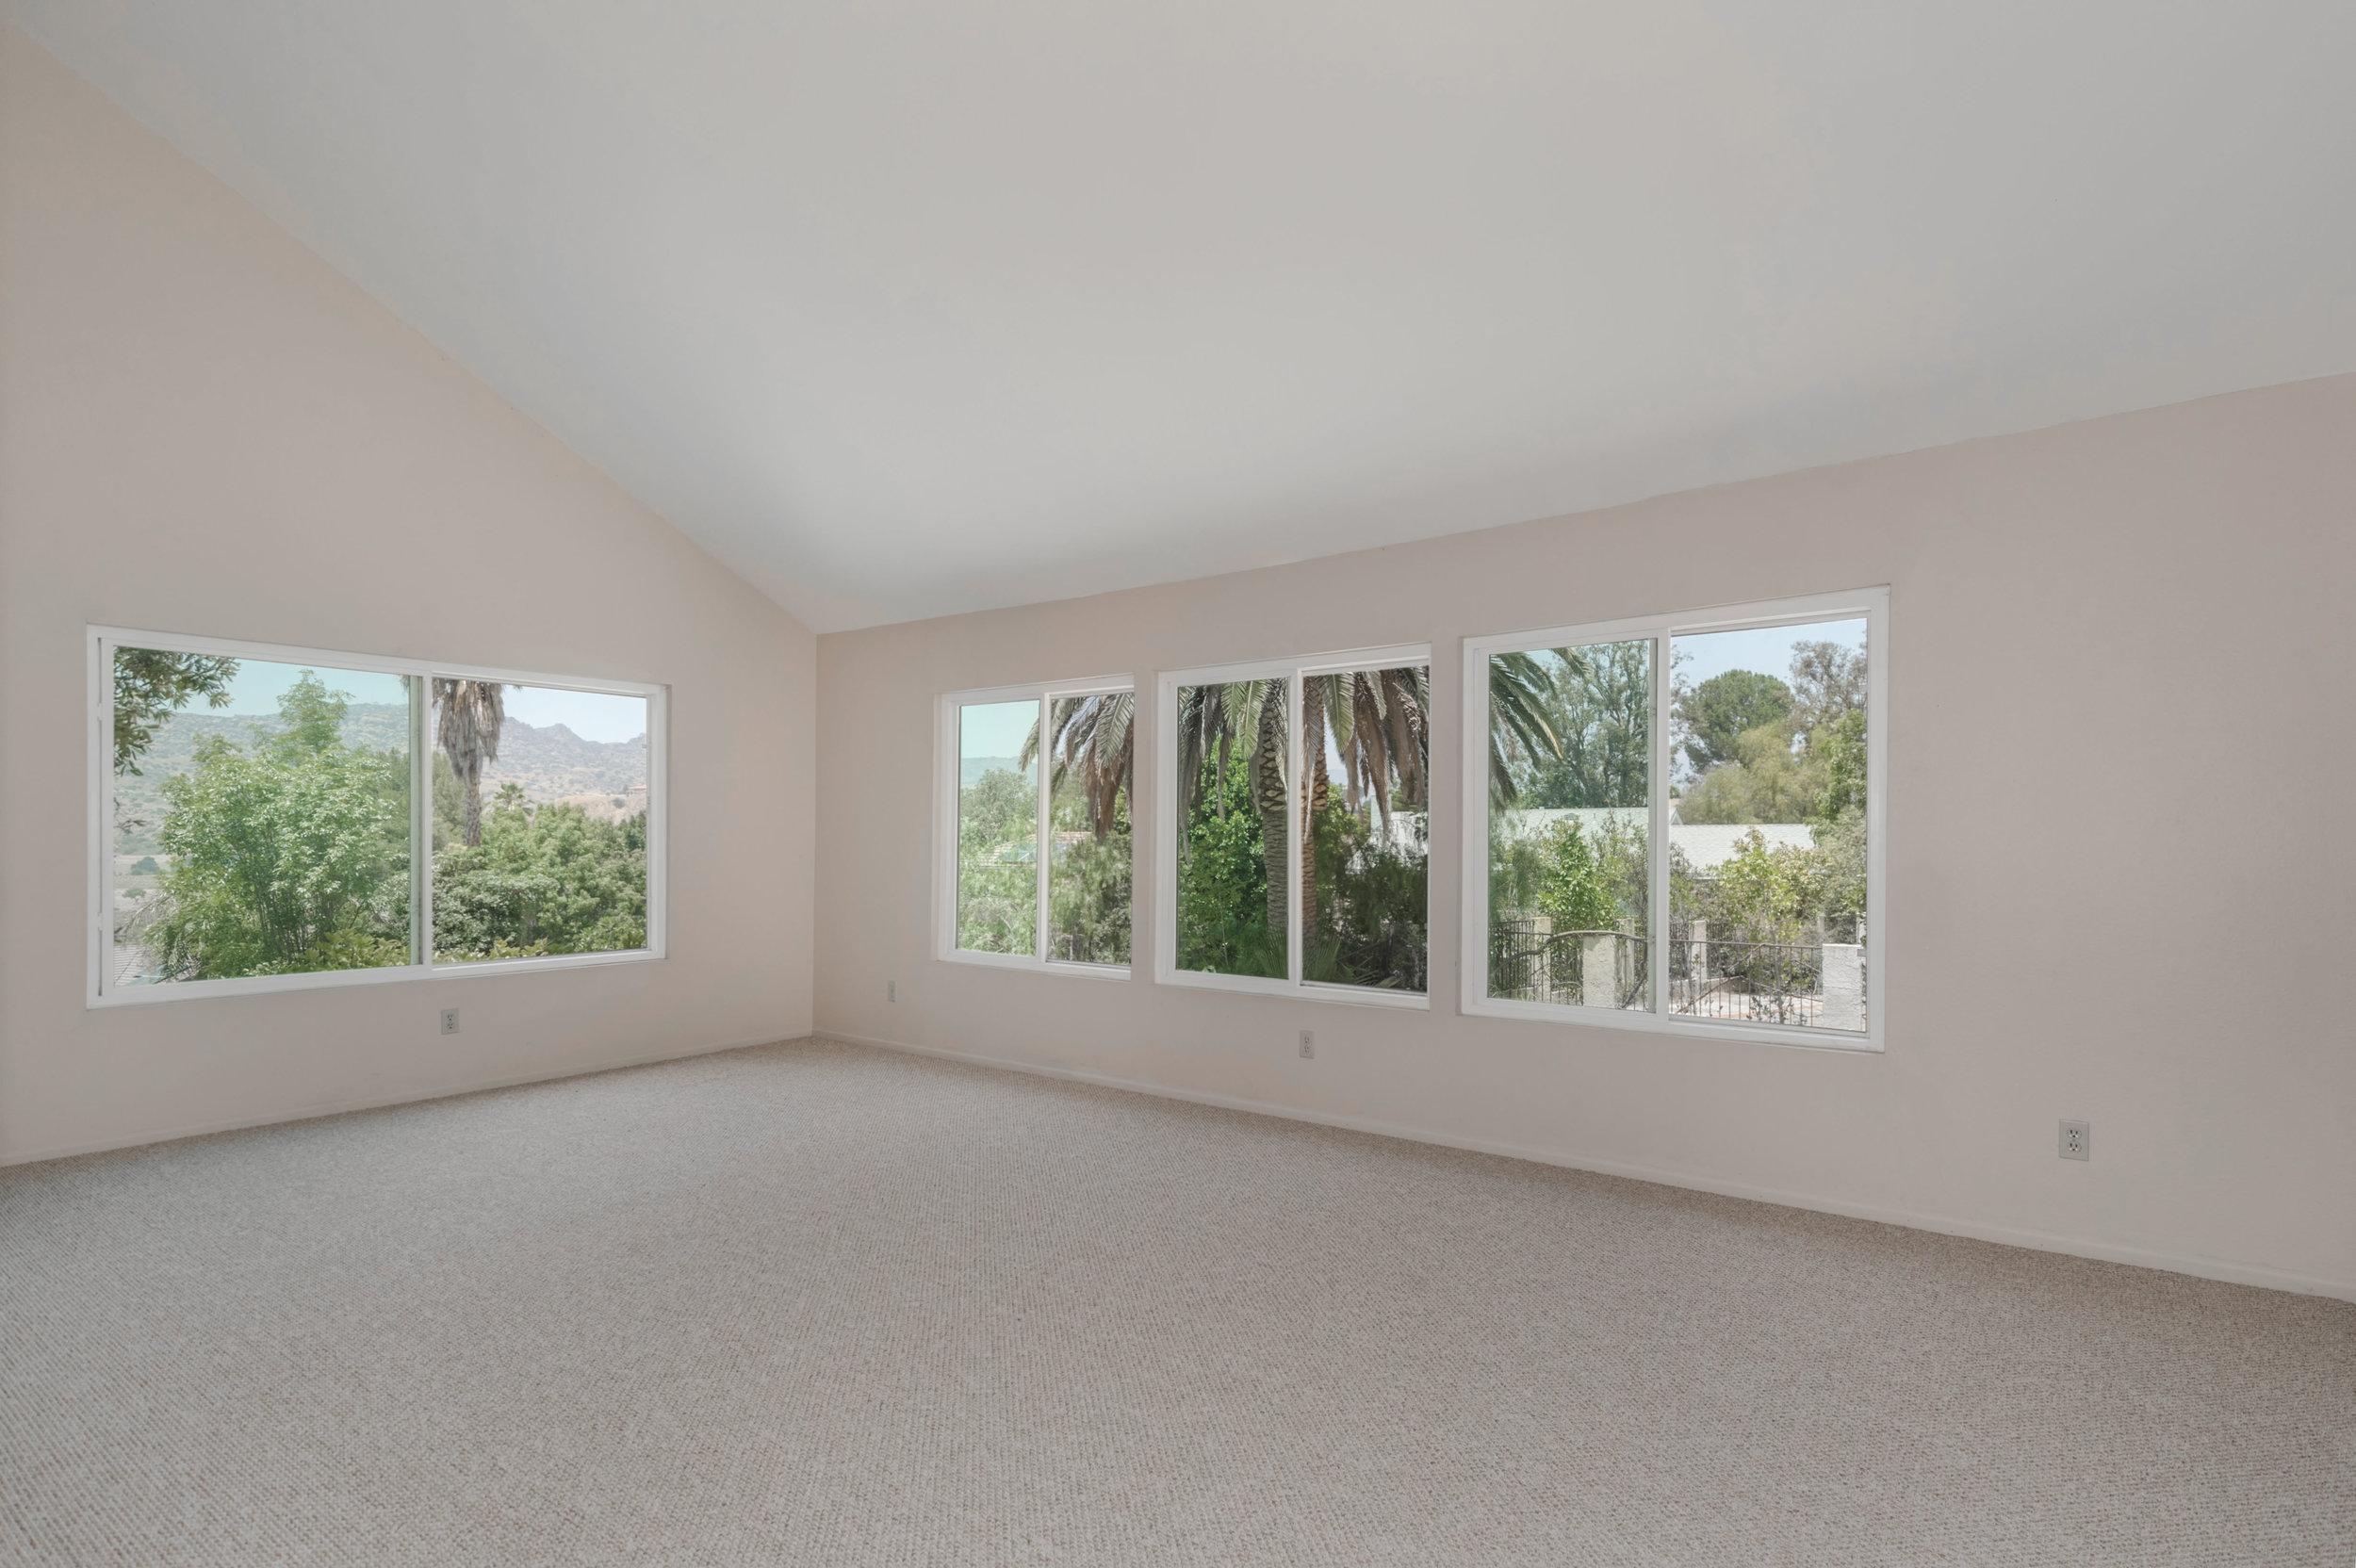 010 living room 8832 Moorcroft Avenue West Hills For Sale Lease The Malibu Life Team Luxury Real Estate.jpg